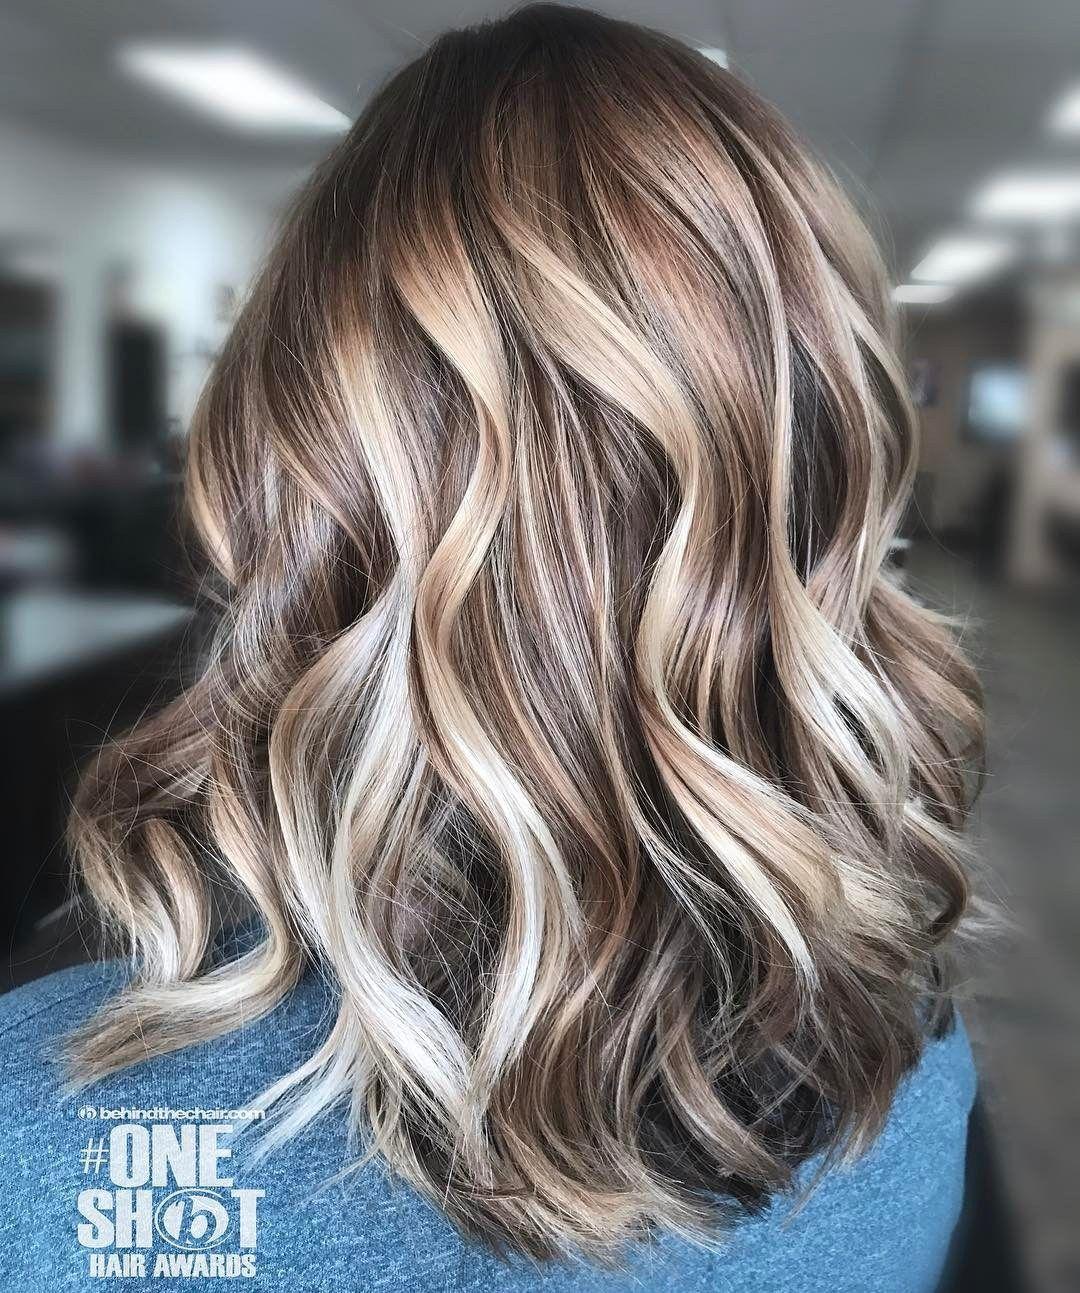 Medium Hair And Multi Colored Balayage Blondehairbalayage Hair Styles Balayage Hair Hair Color Balayage